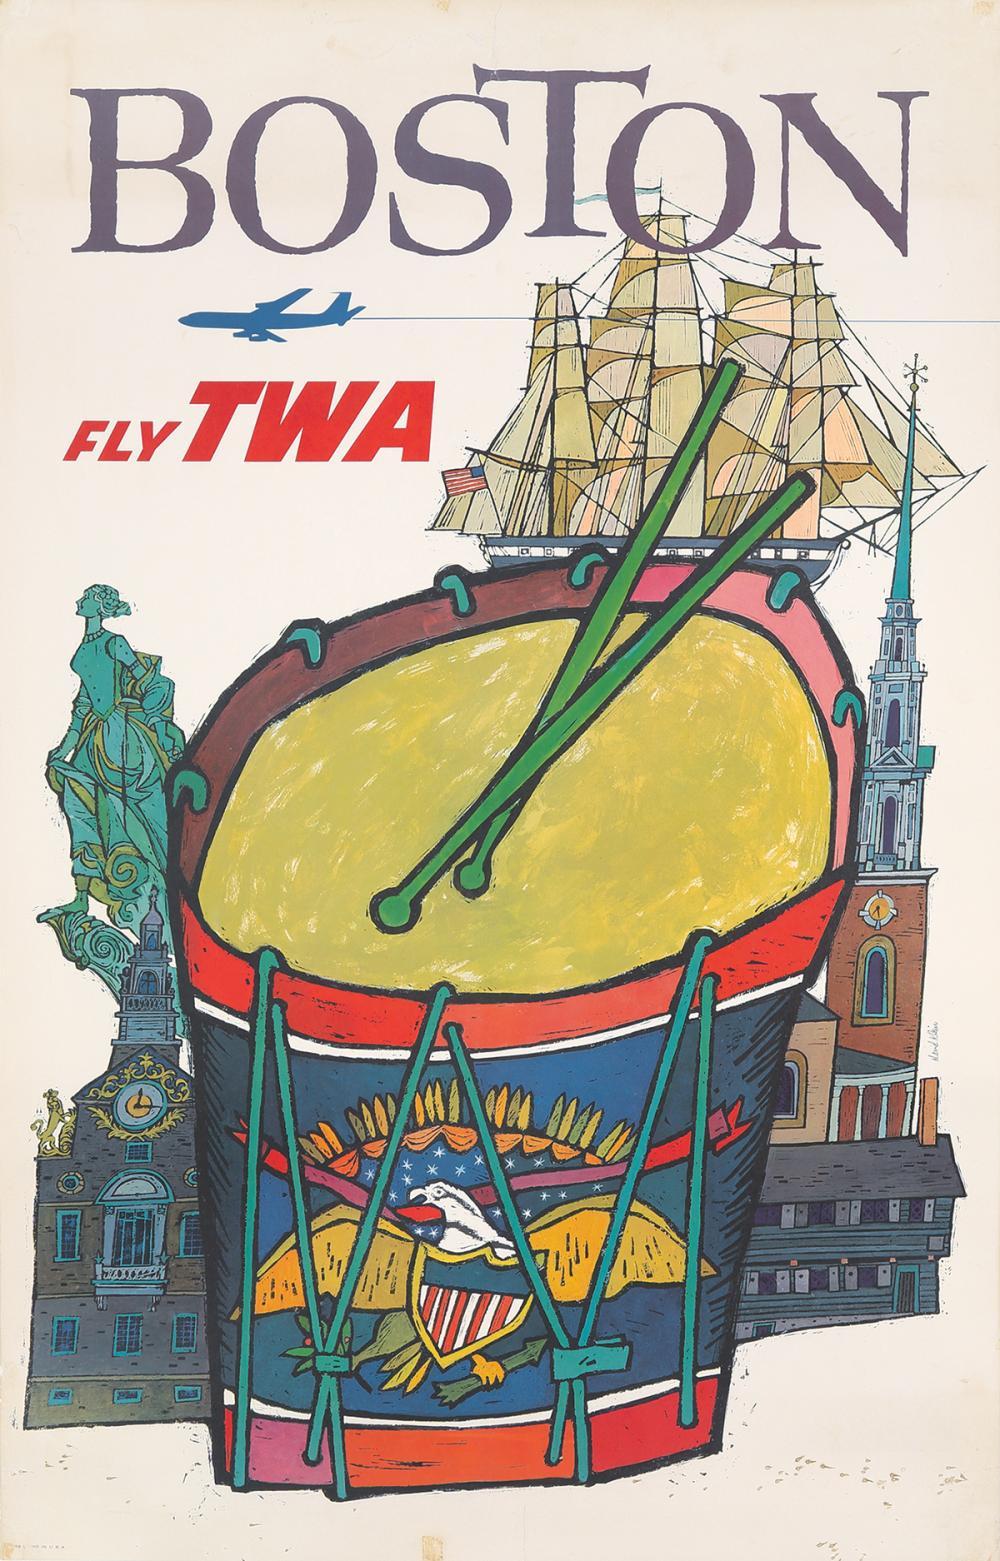 TWA / Boston. 1955.